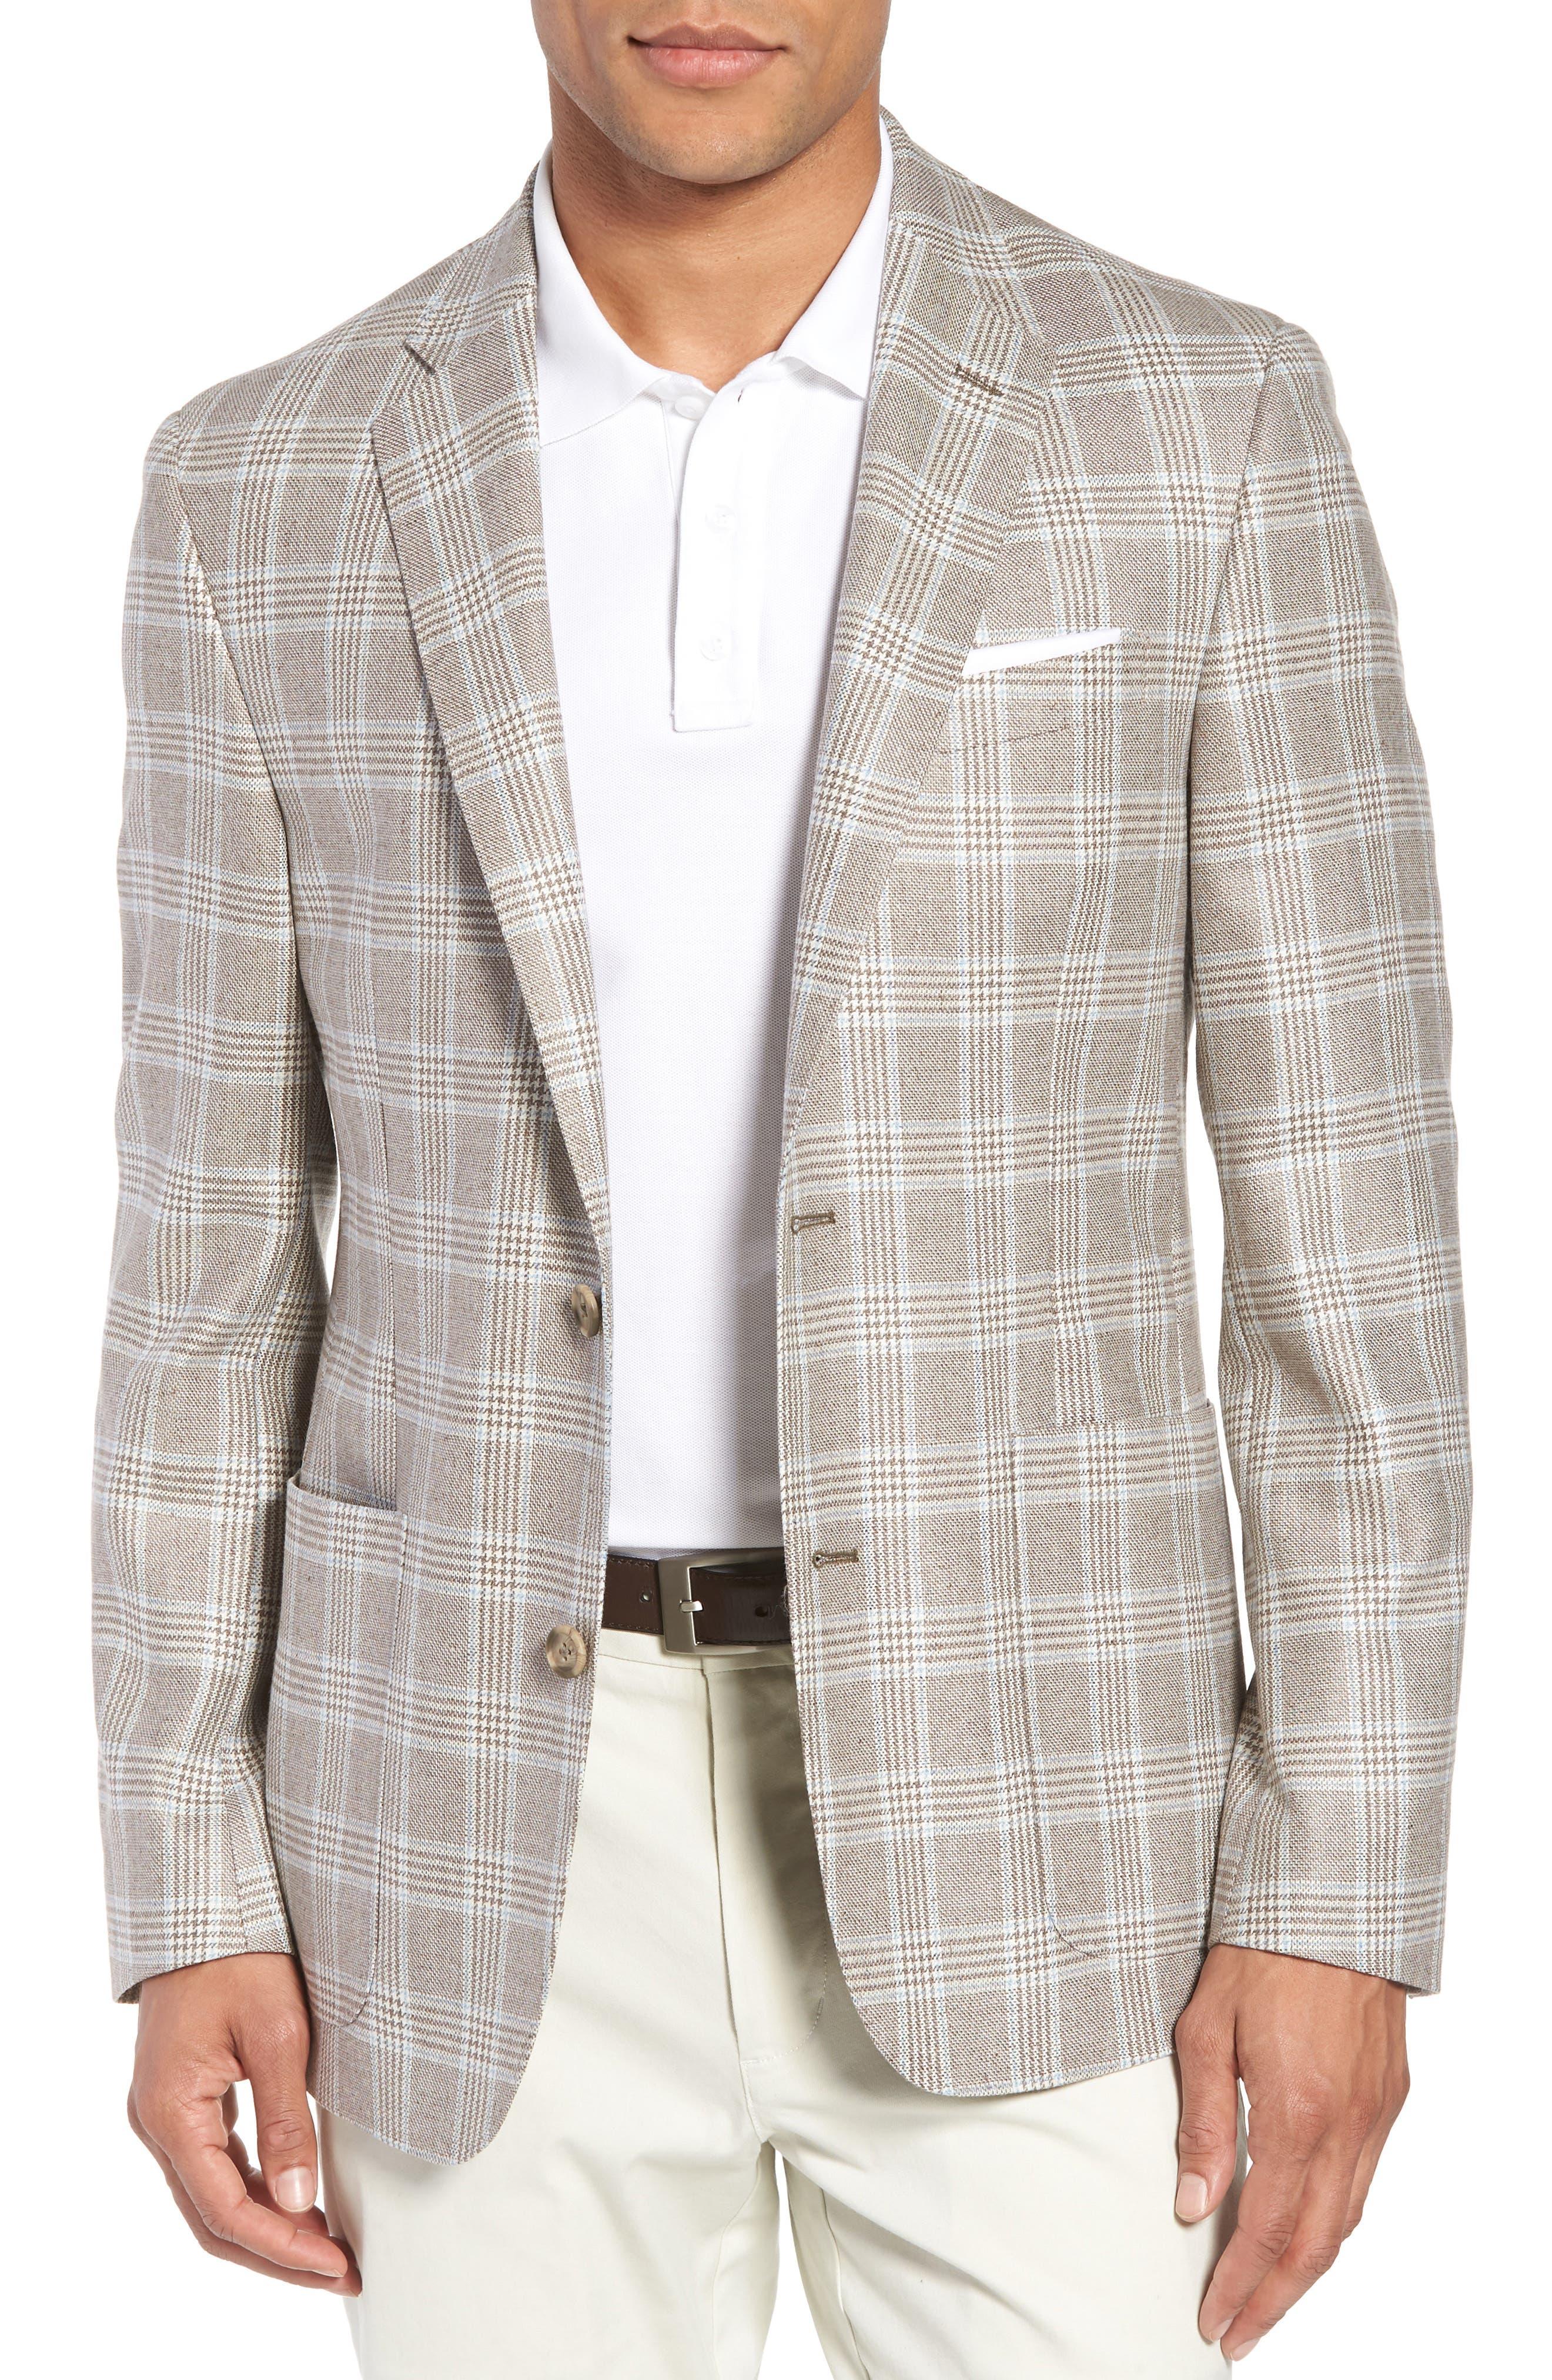 Alternate Image 1 Selected - Nordstrom Men's Shop Trim Fit Plaid Silk & Wool Sport Coat